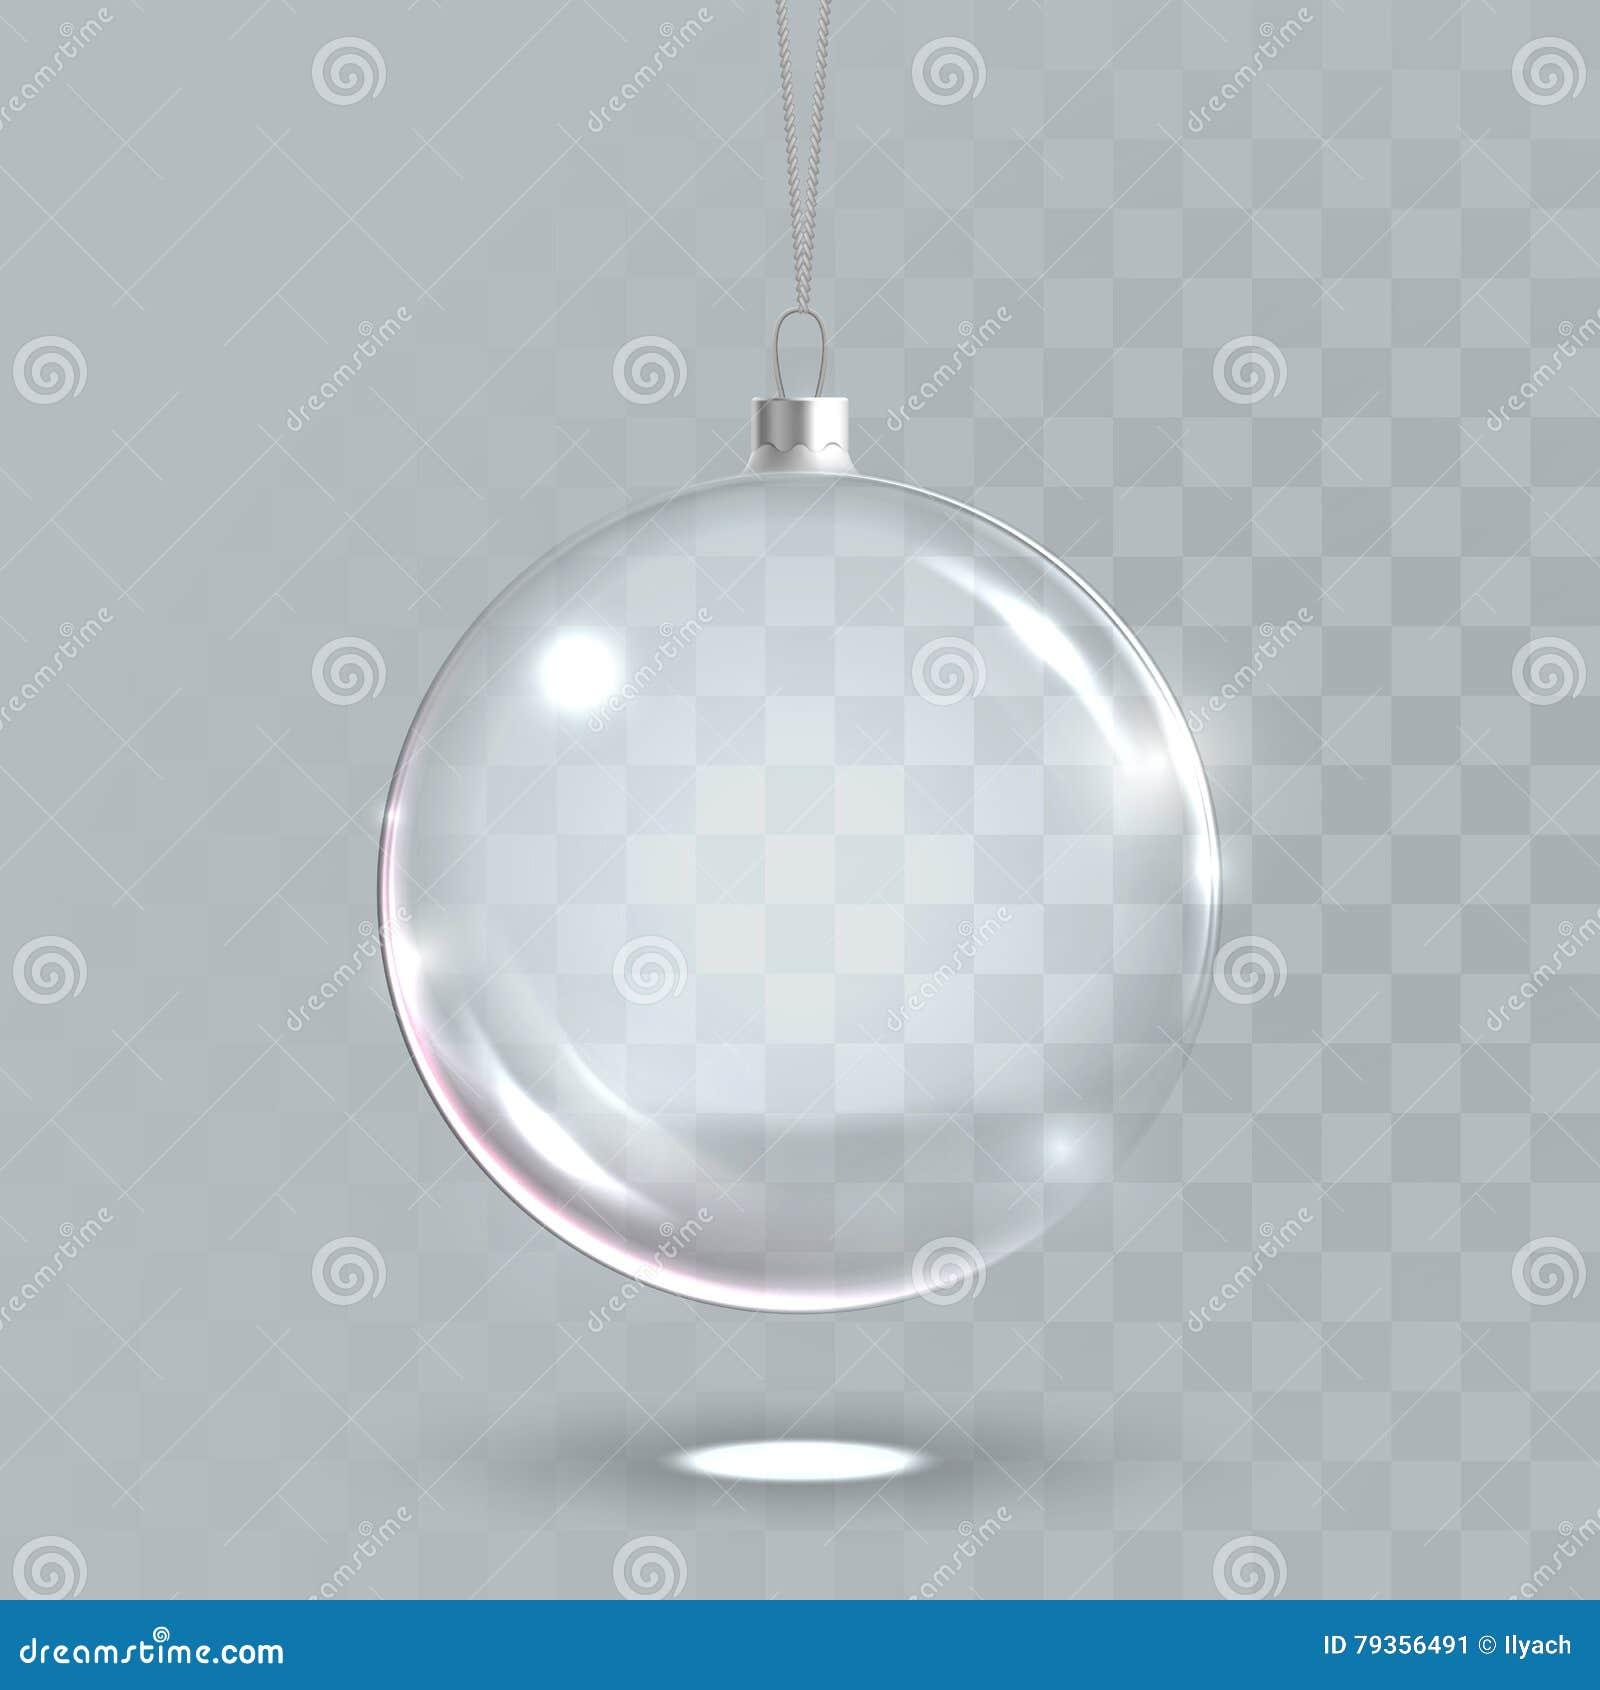 Christmas Light Hanging Service